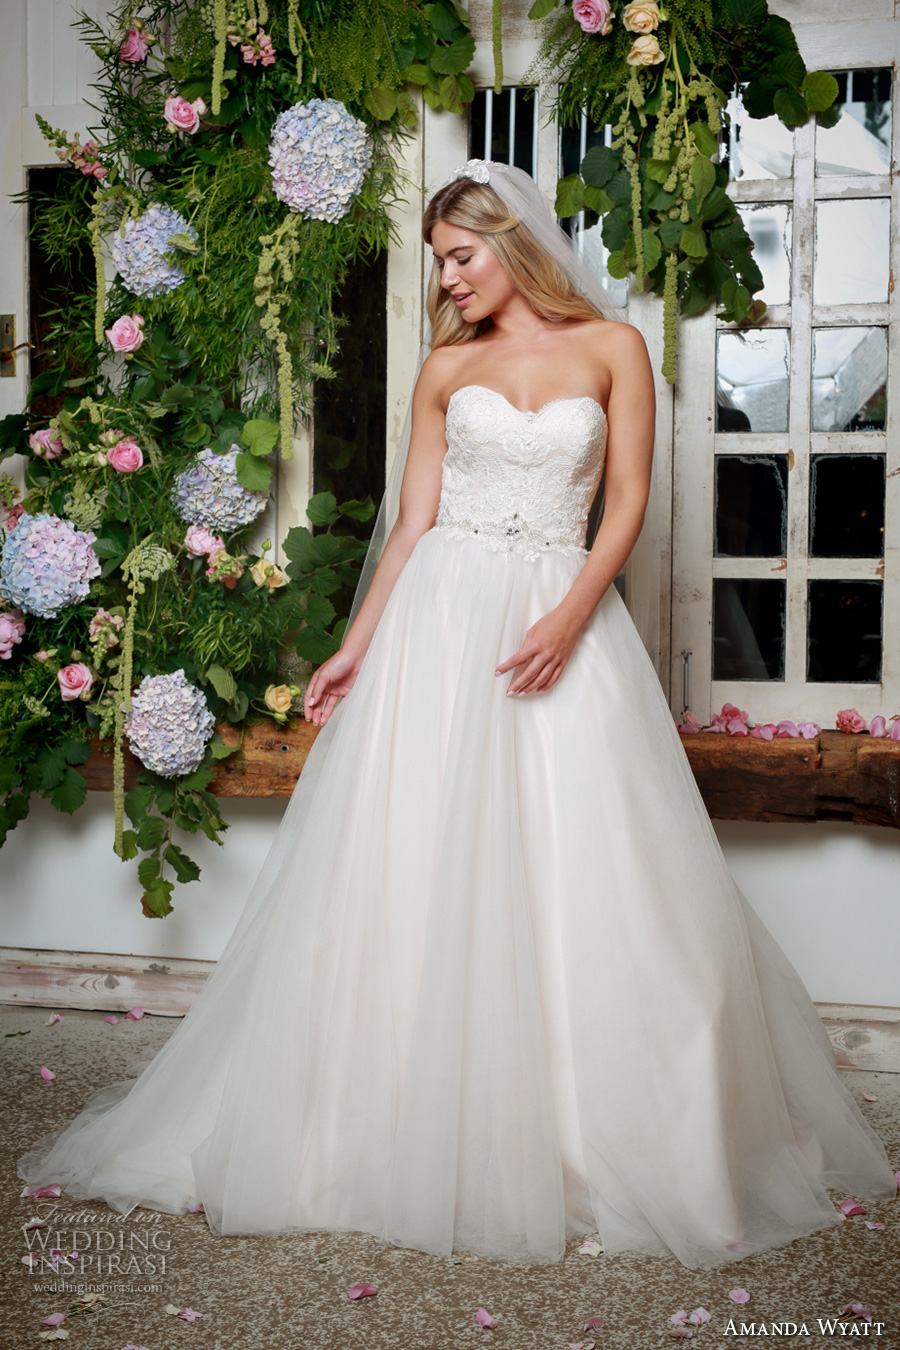 Blush Tulle Wedding Dress 62 Ideal amanda wyatt bridal strapless